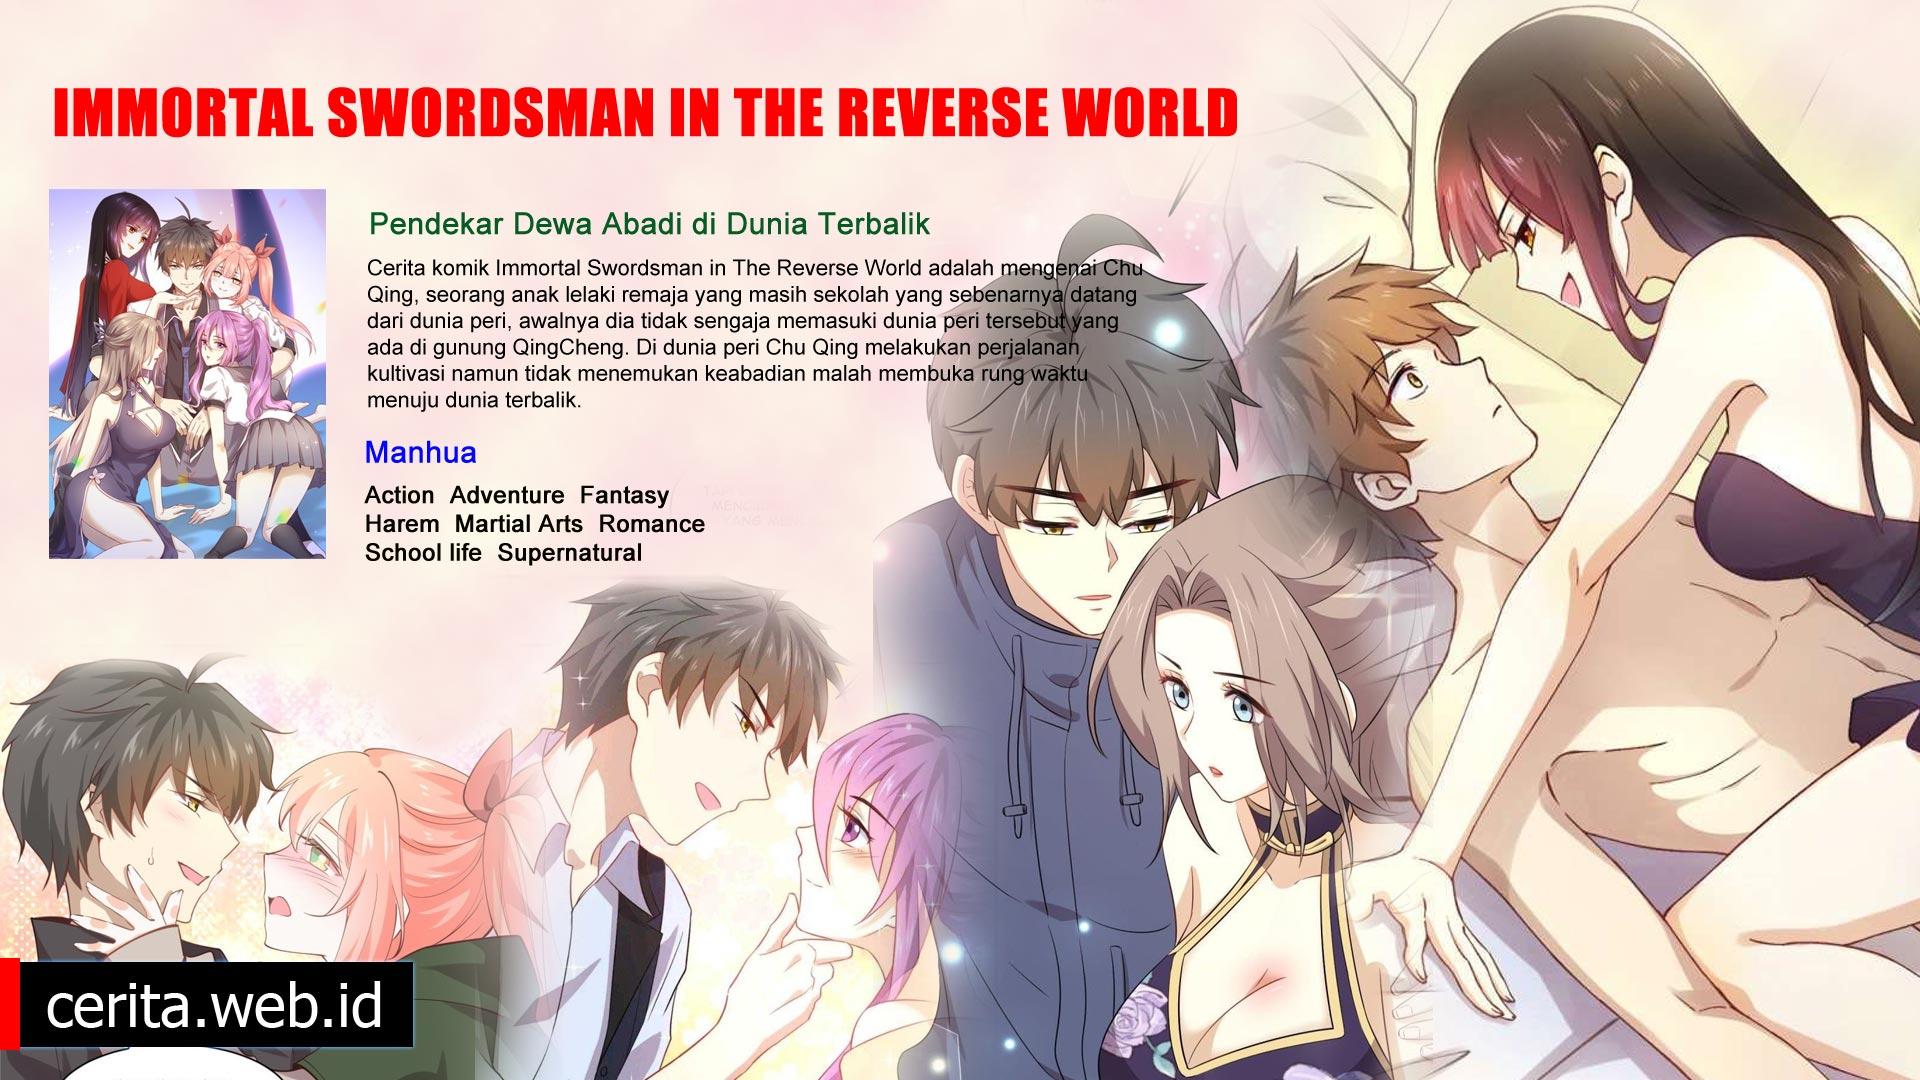 Sinopsis Manhua Immortal Swordsman In The Reverse World